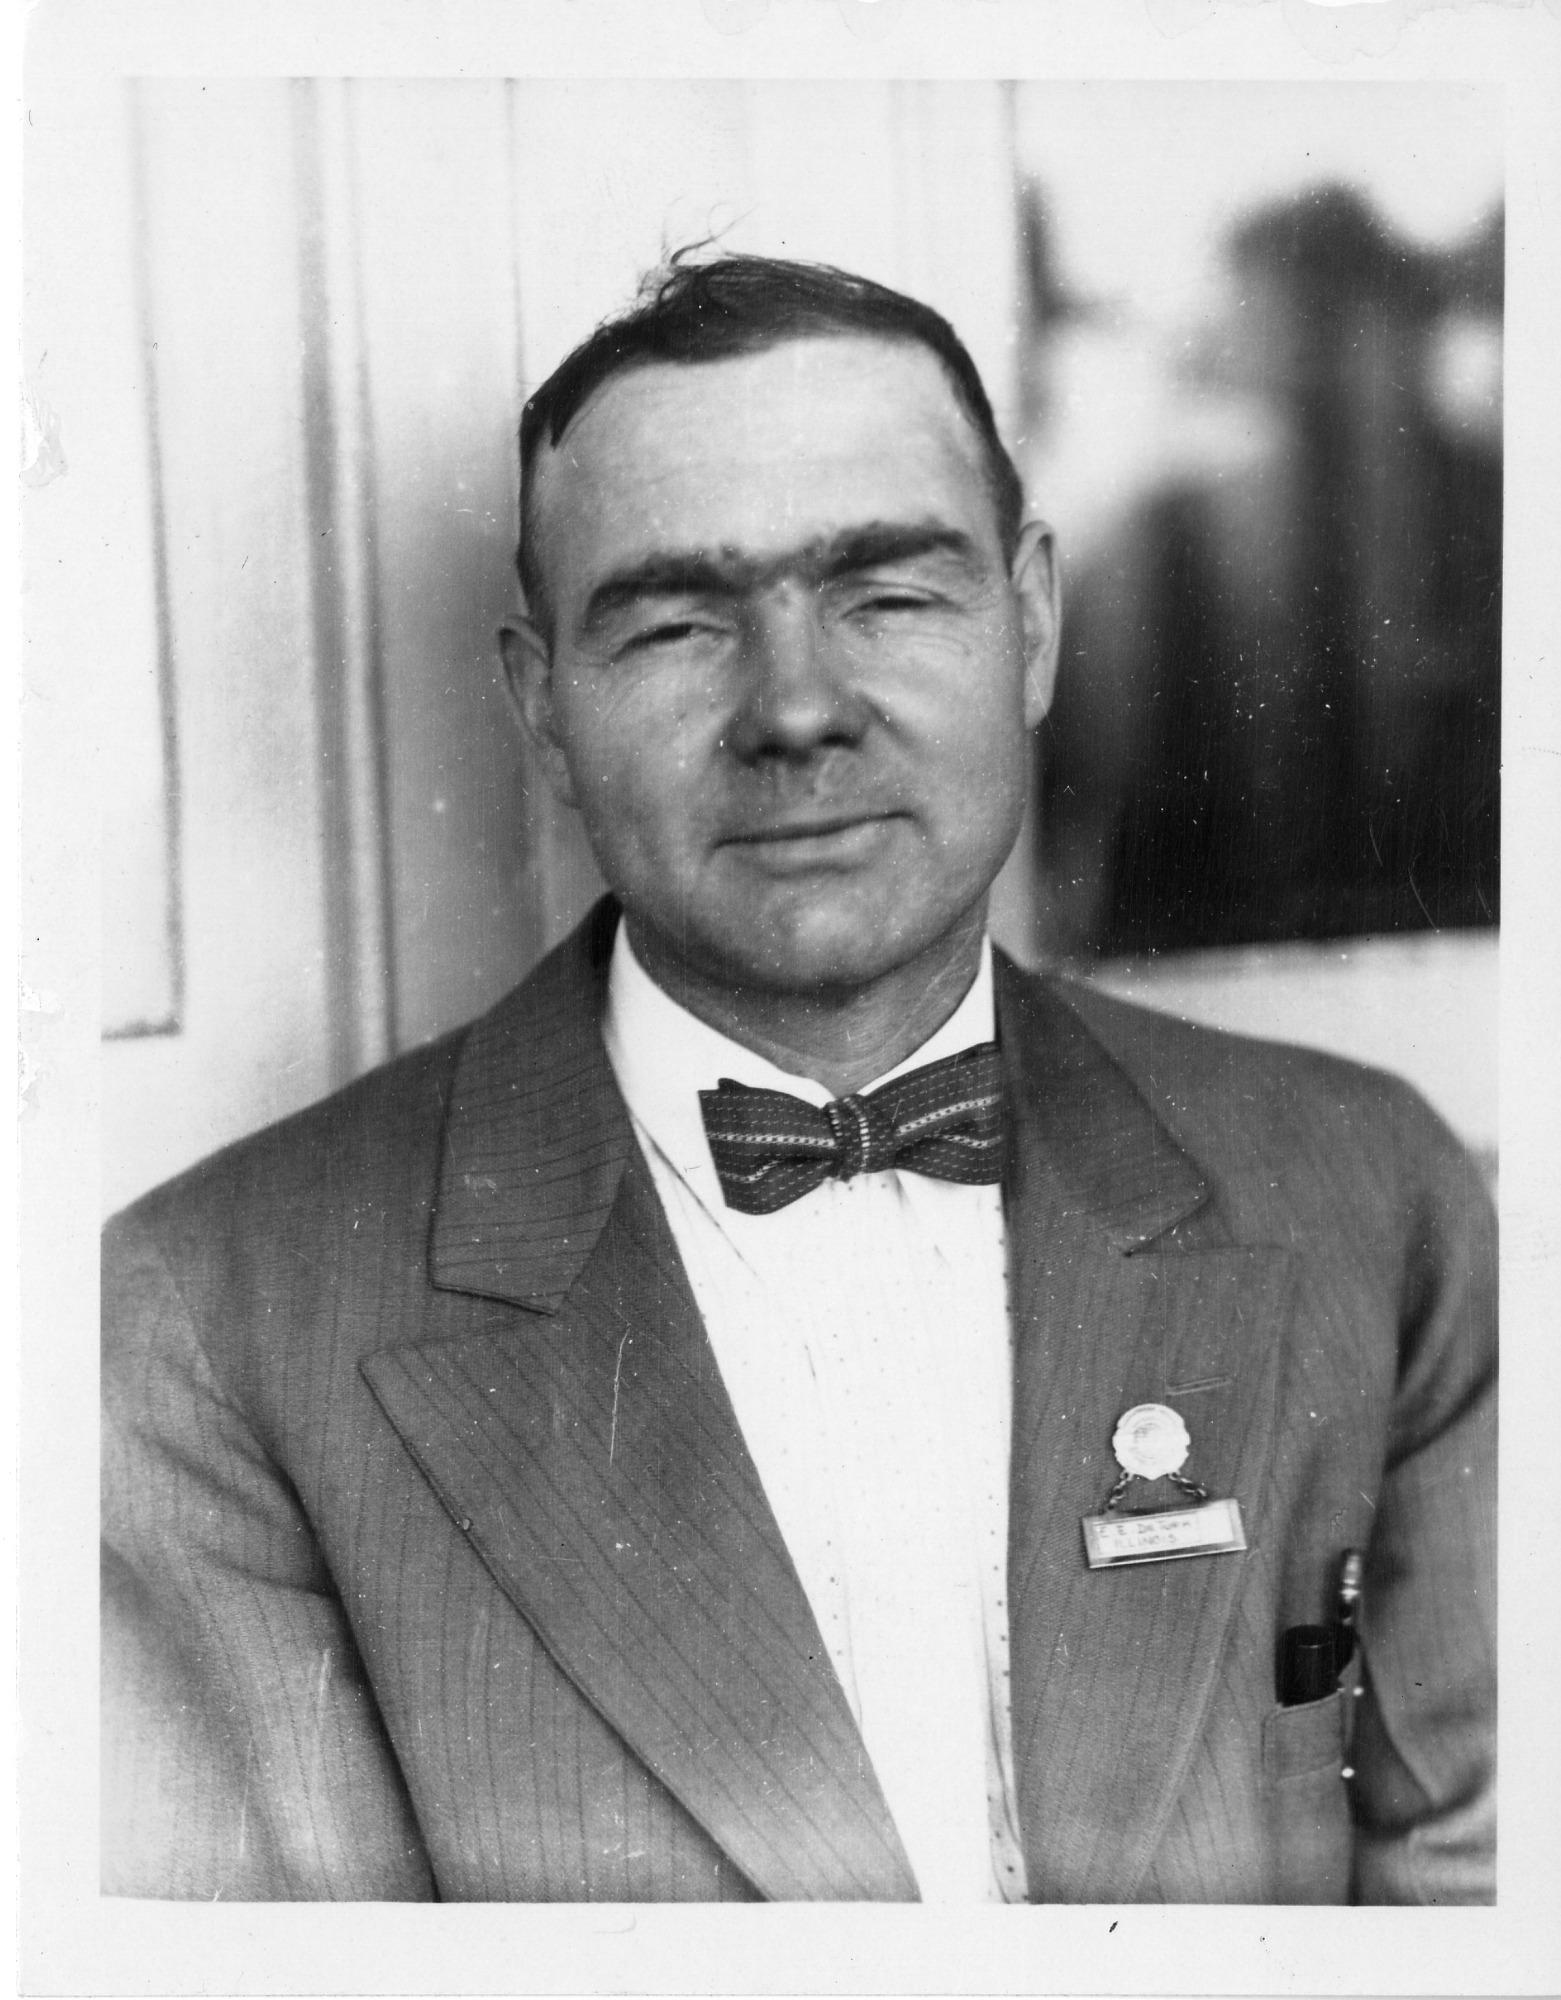 Ernest Everett DeTurk (1887-1963)